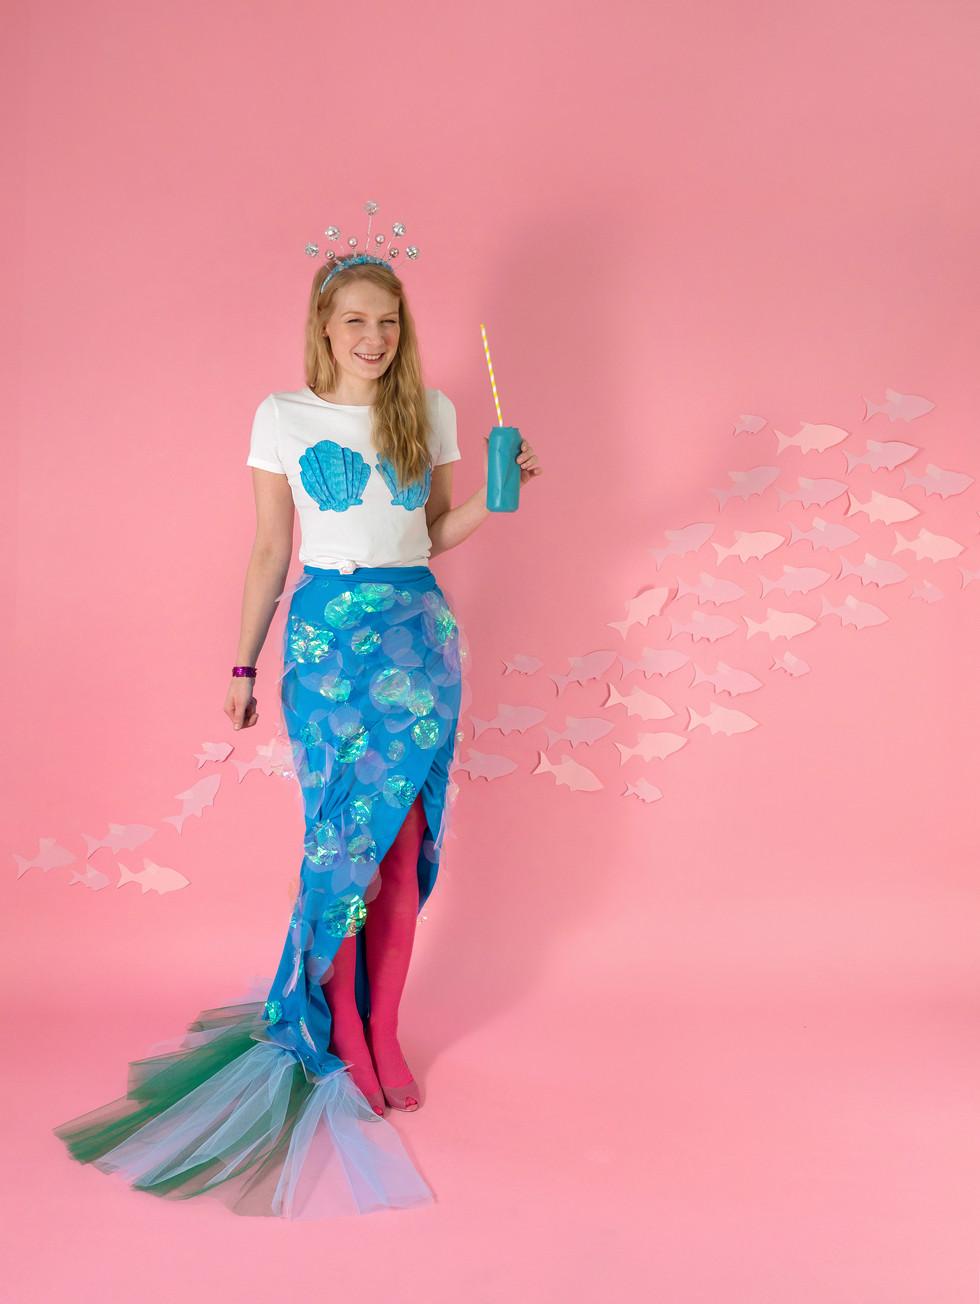 mermaid costume for OhHappyDay.com